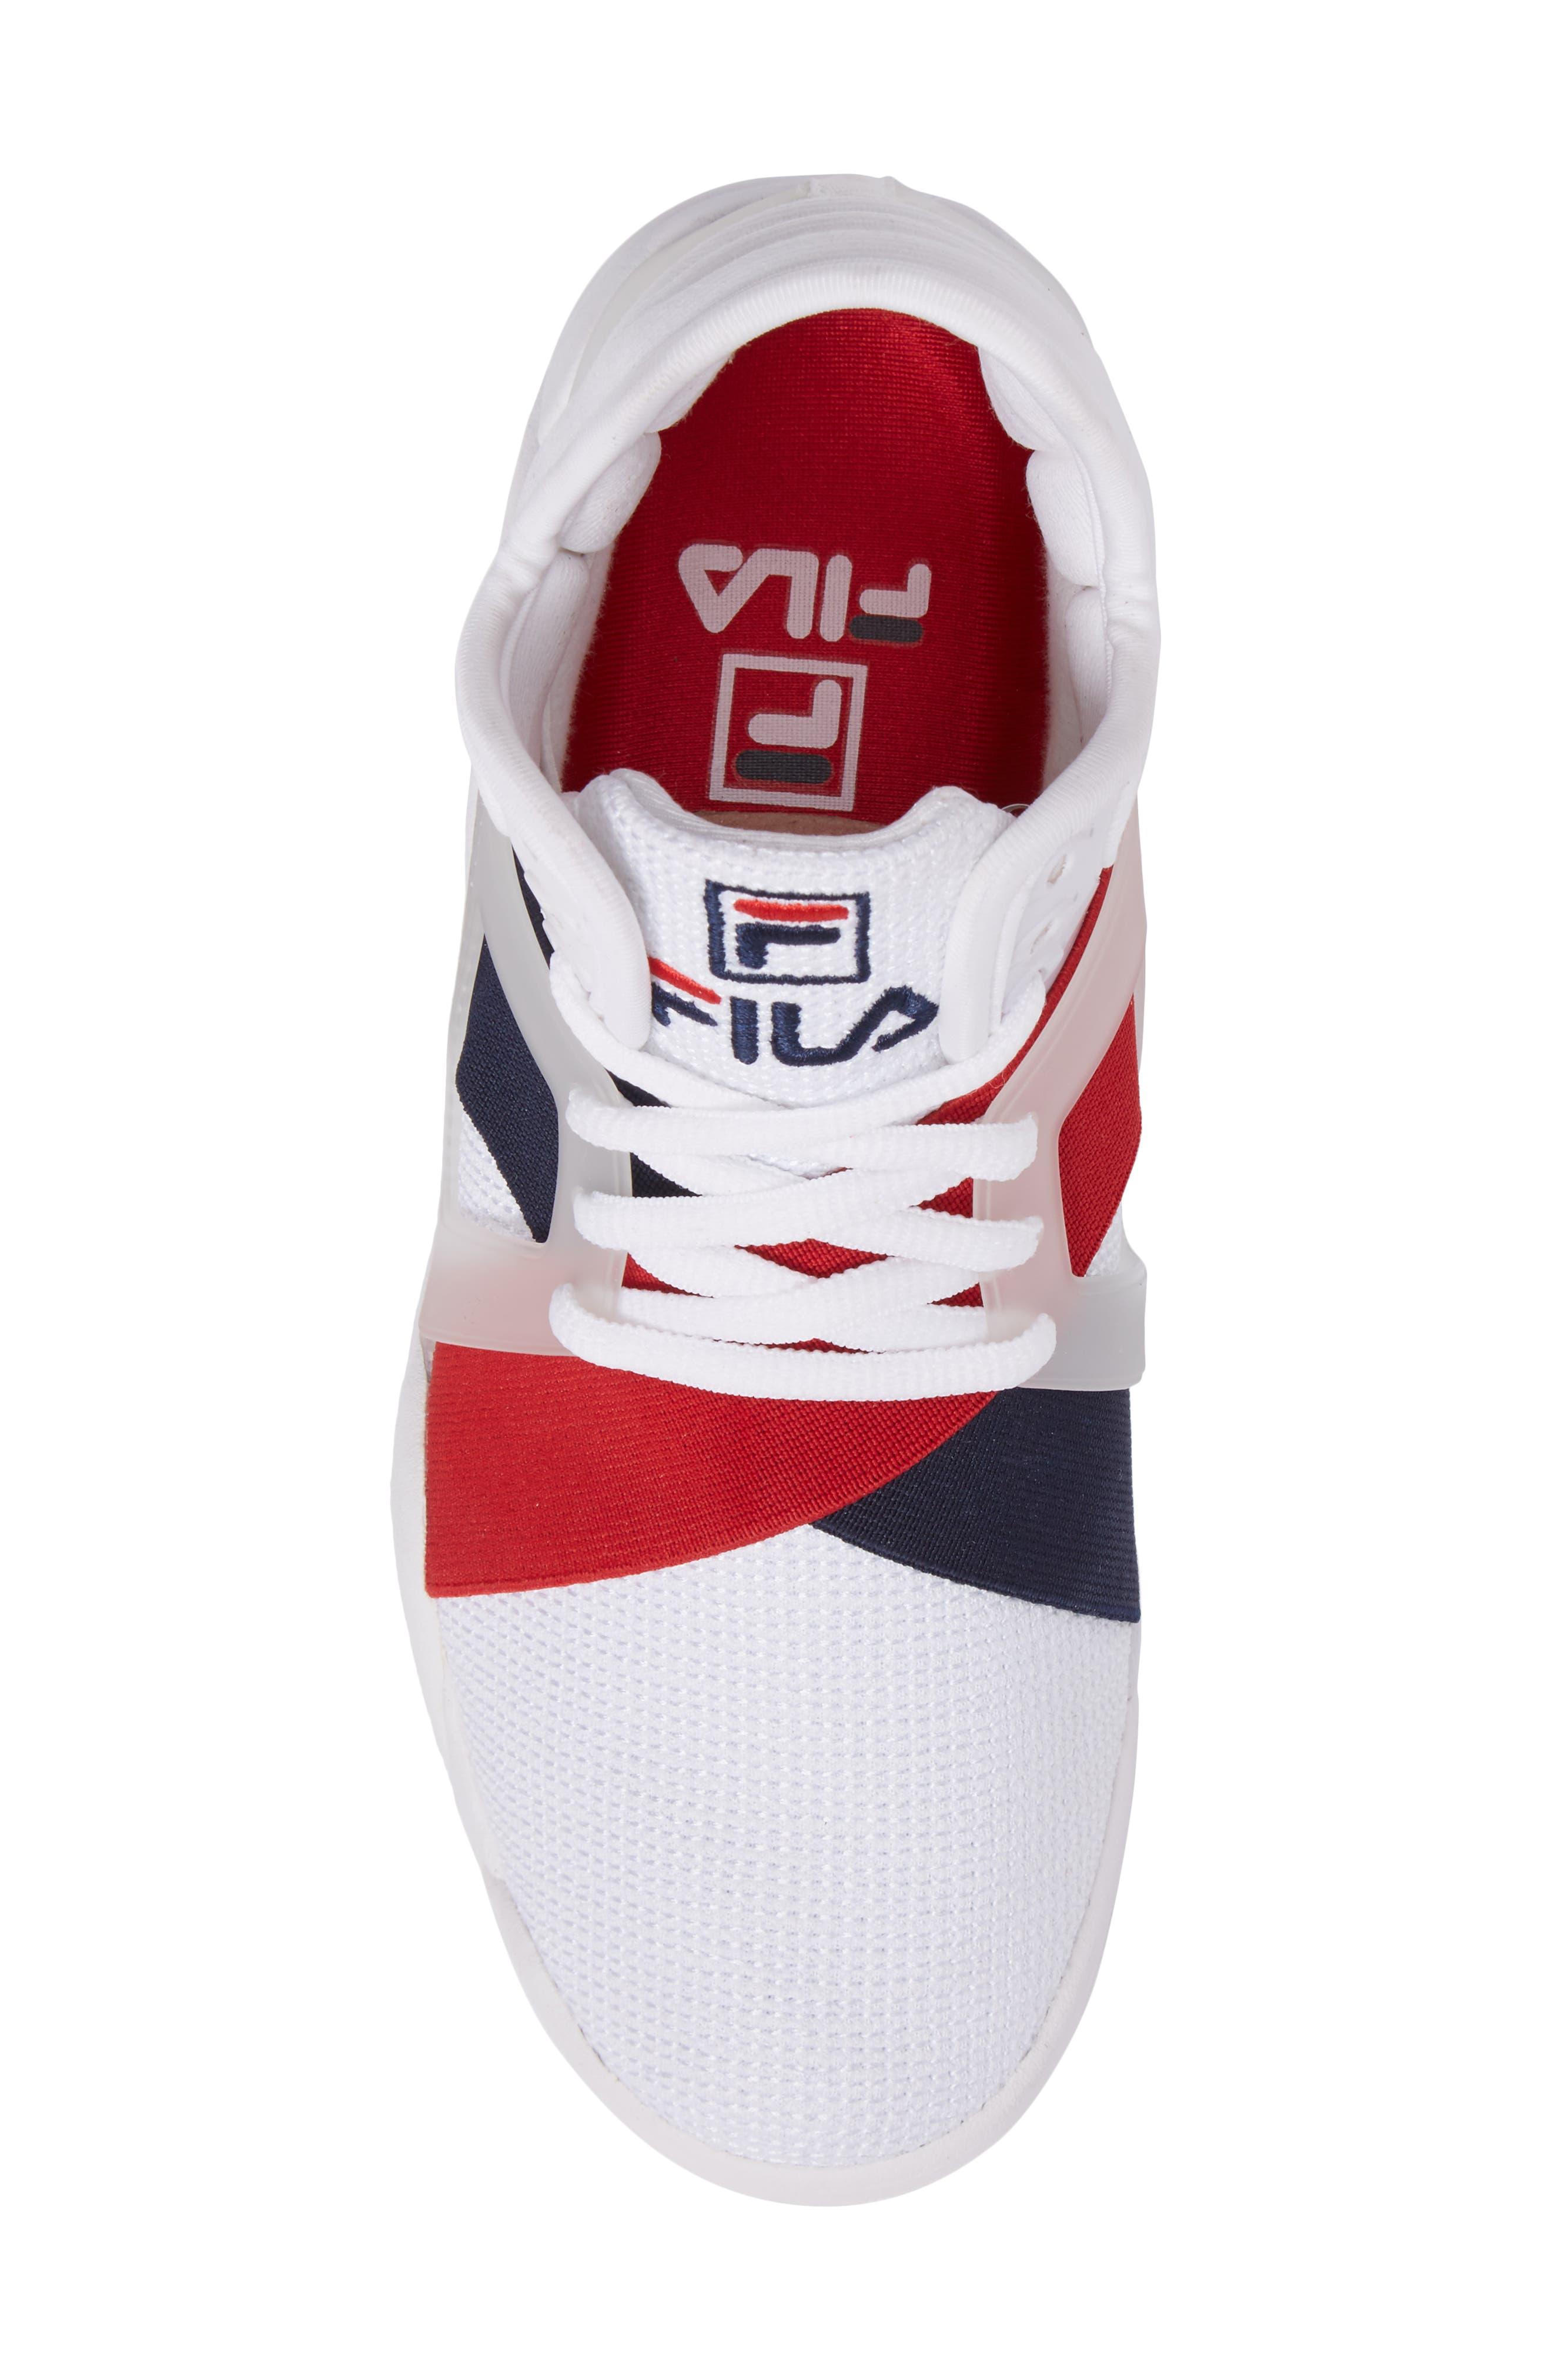 FILA, Cage 17 Logo High Top Sneaker, Alternate thumbnail 5, color, 125